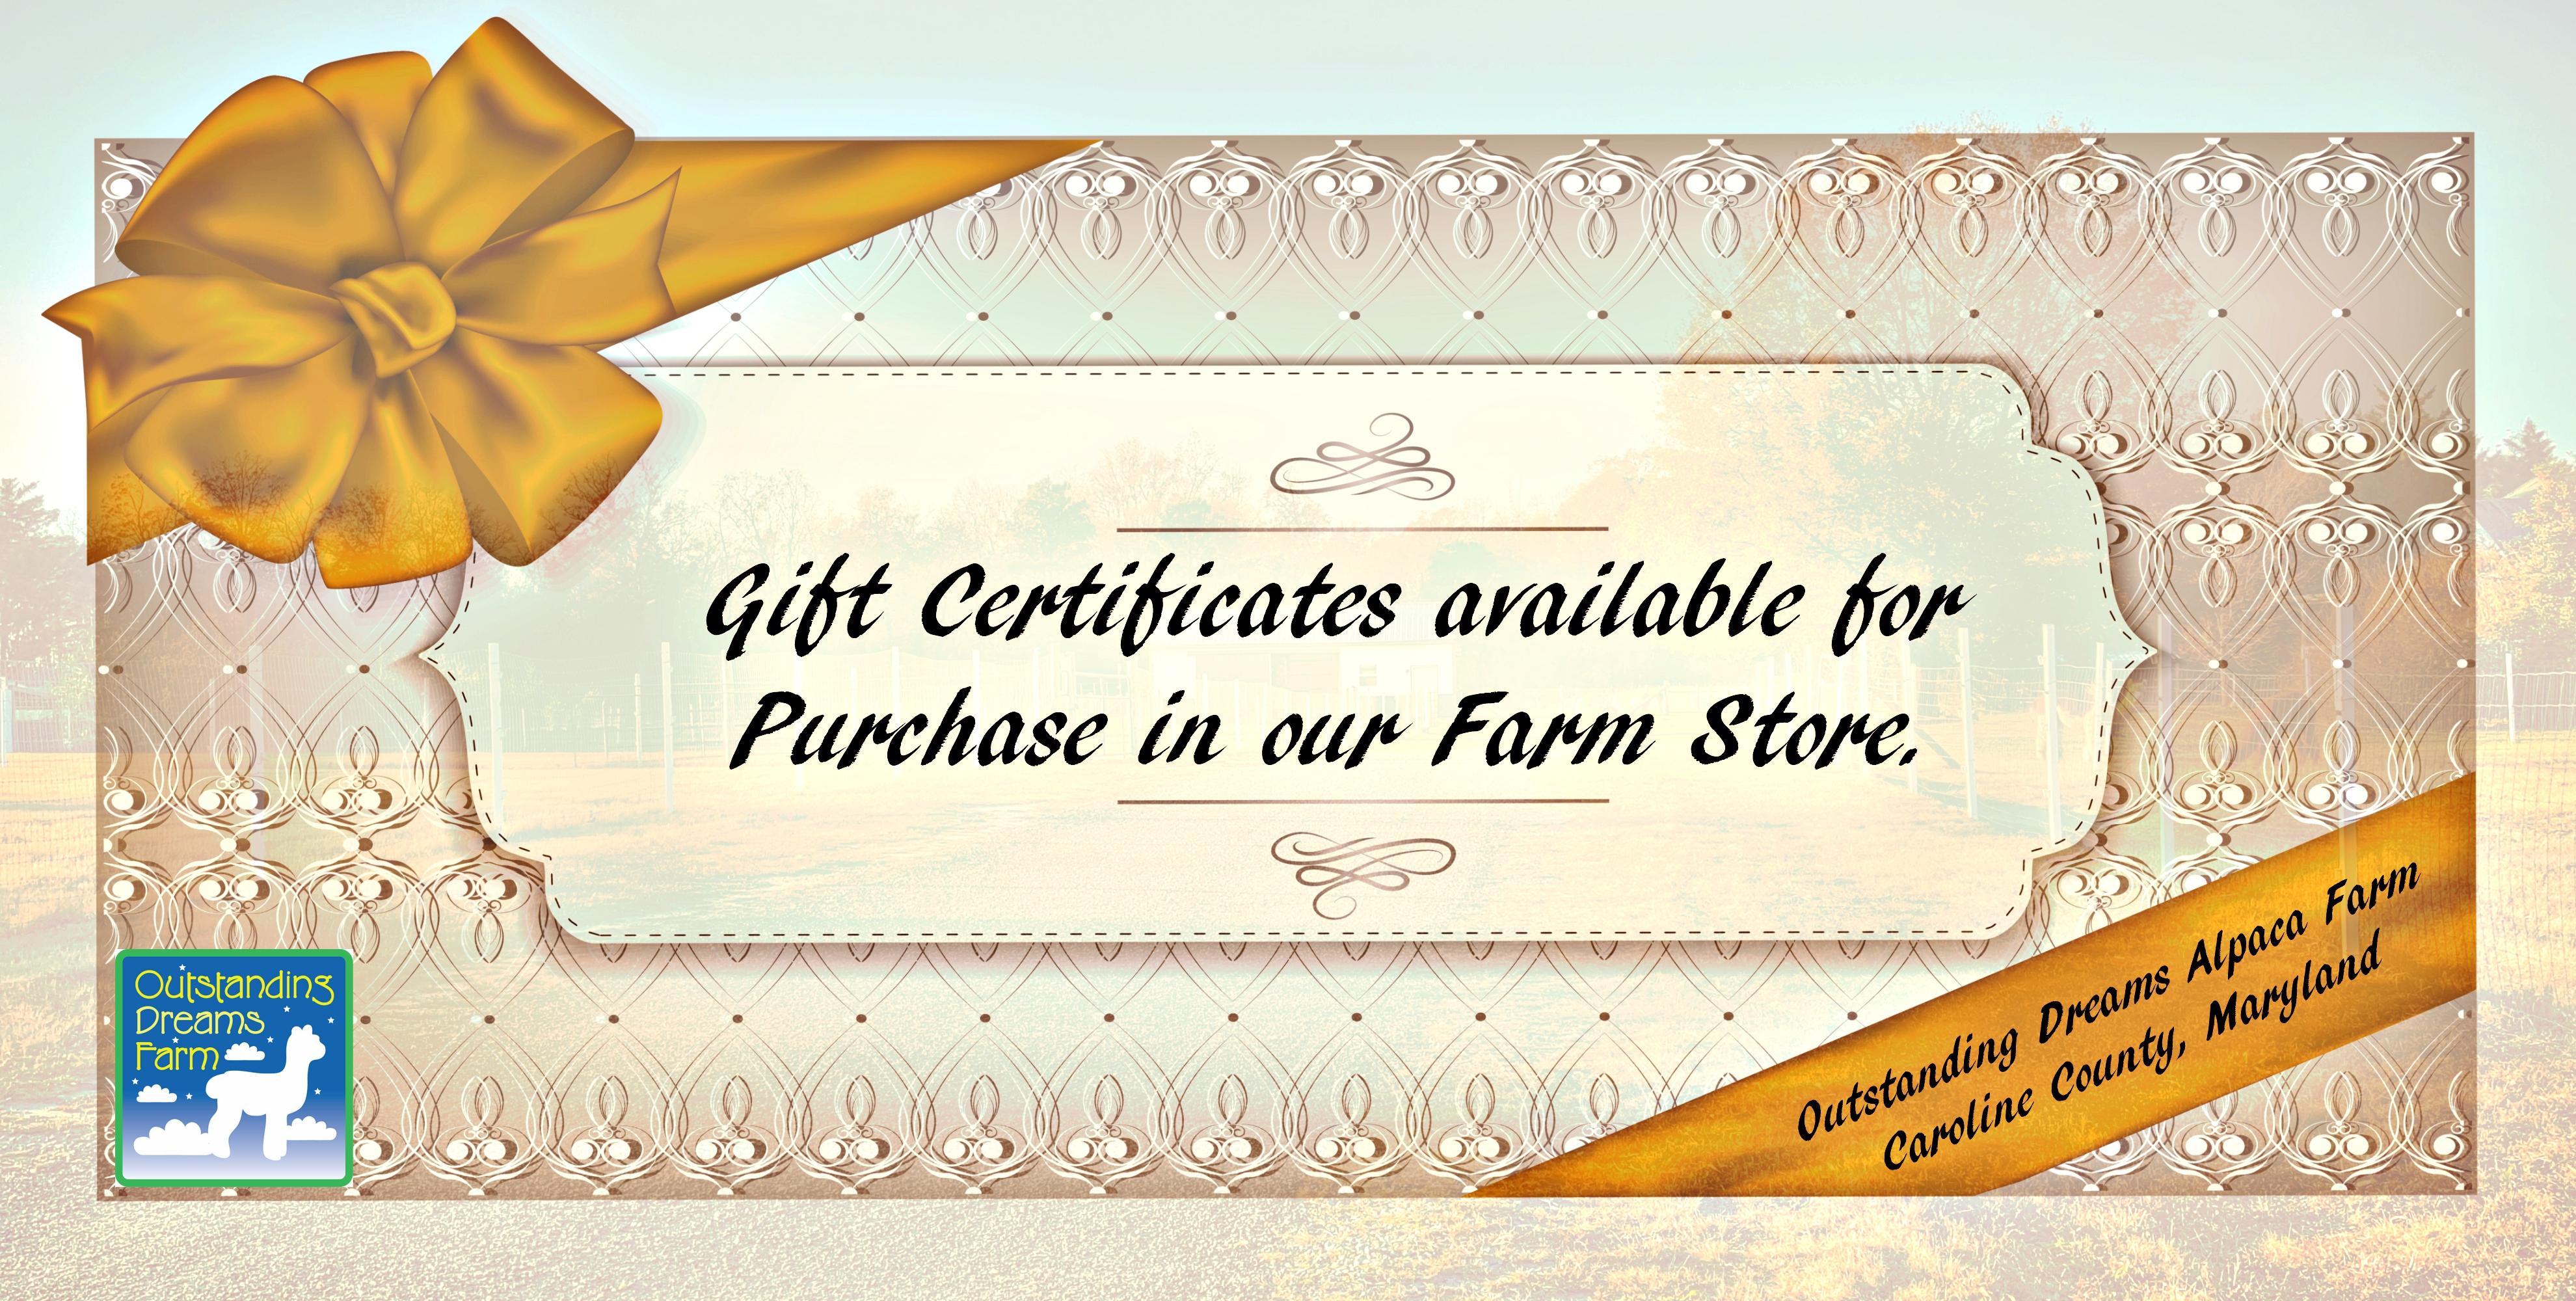 Outstanding Dreams Alpaca Farm Gift Certificates